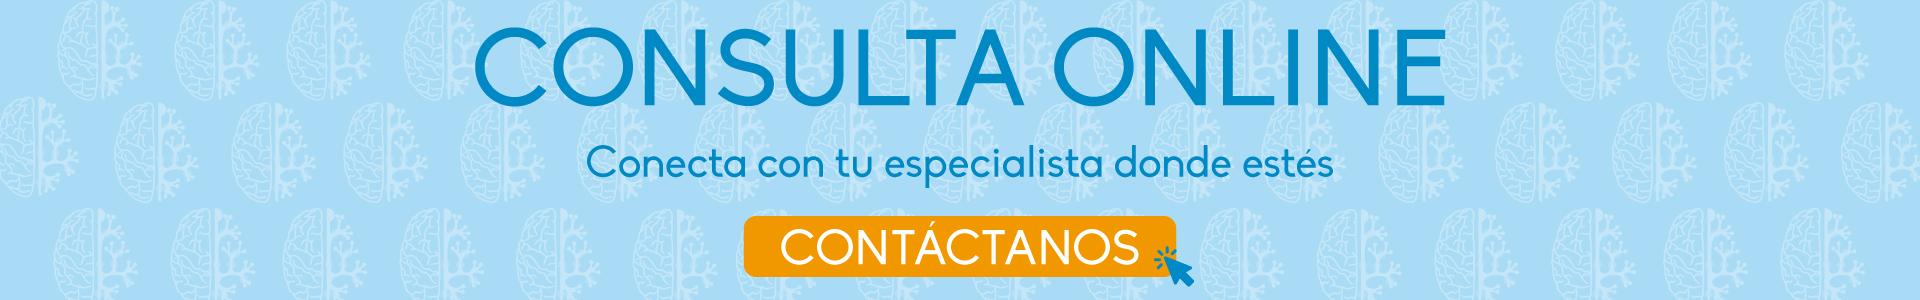 home-consulta-online